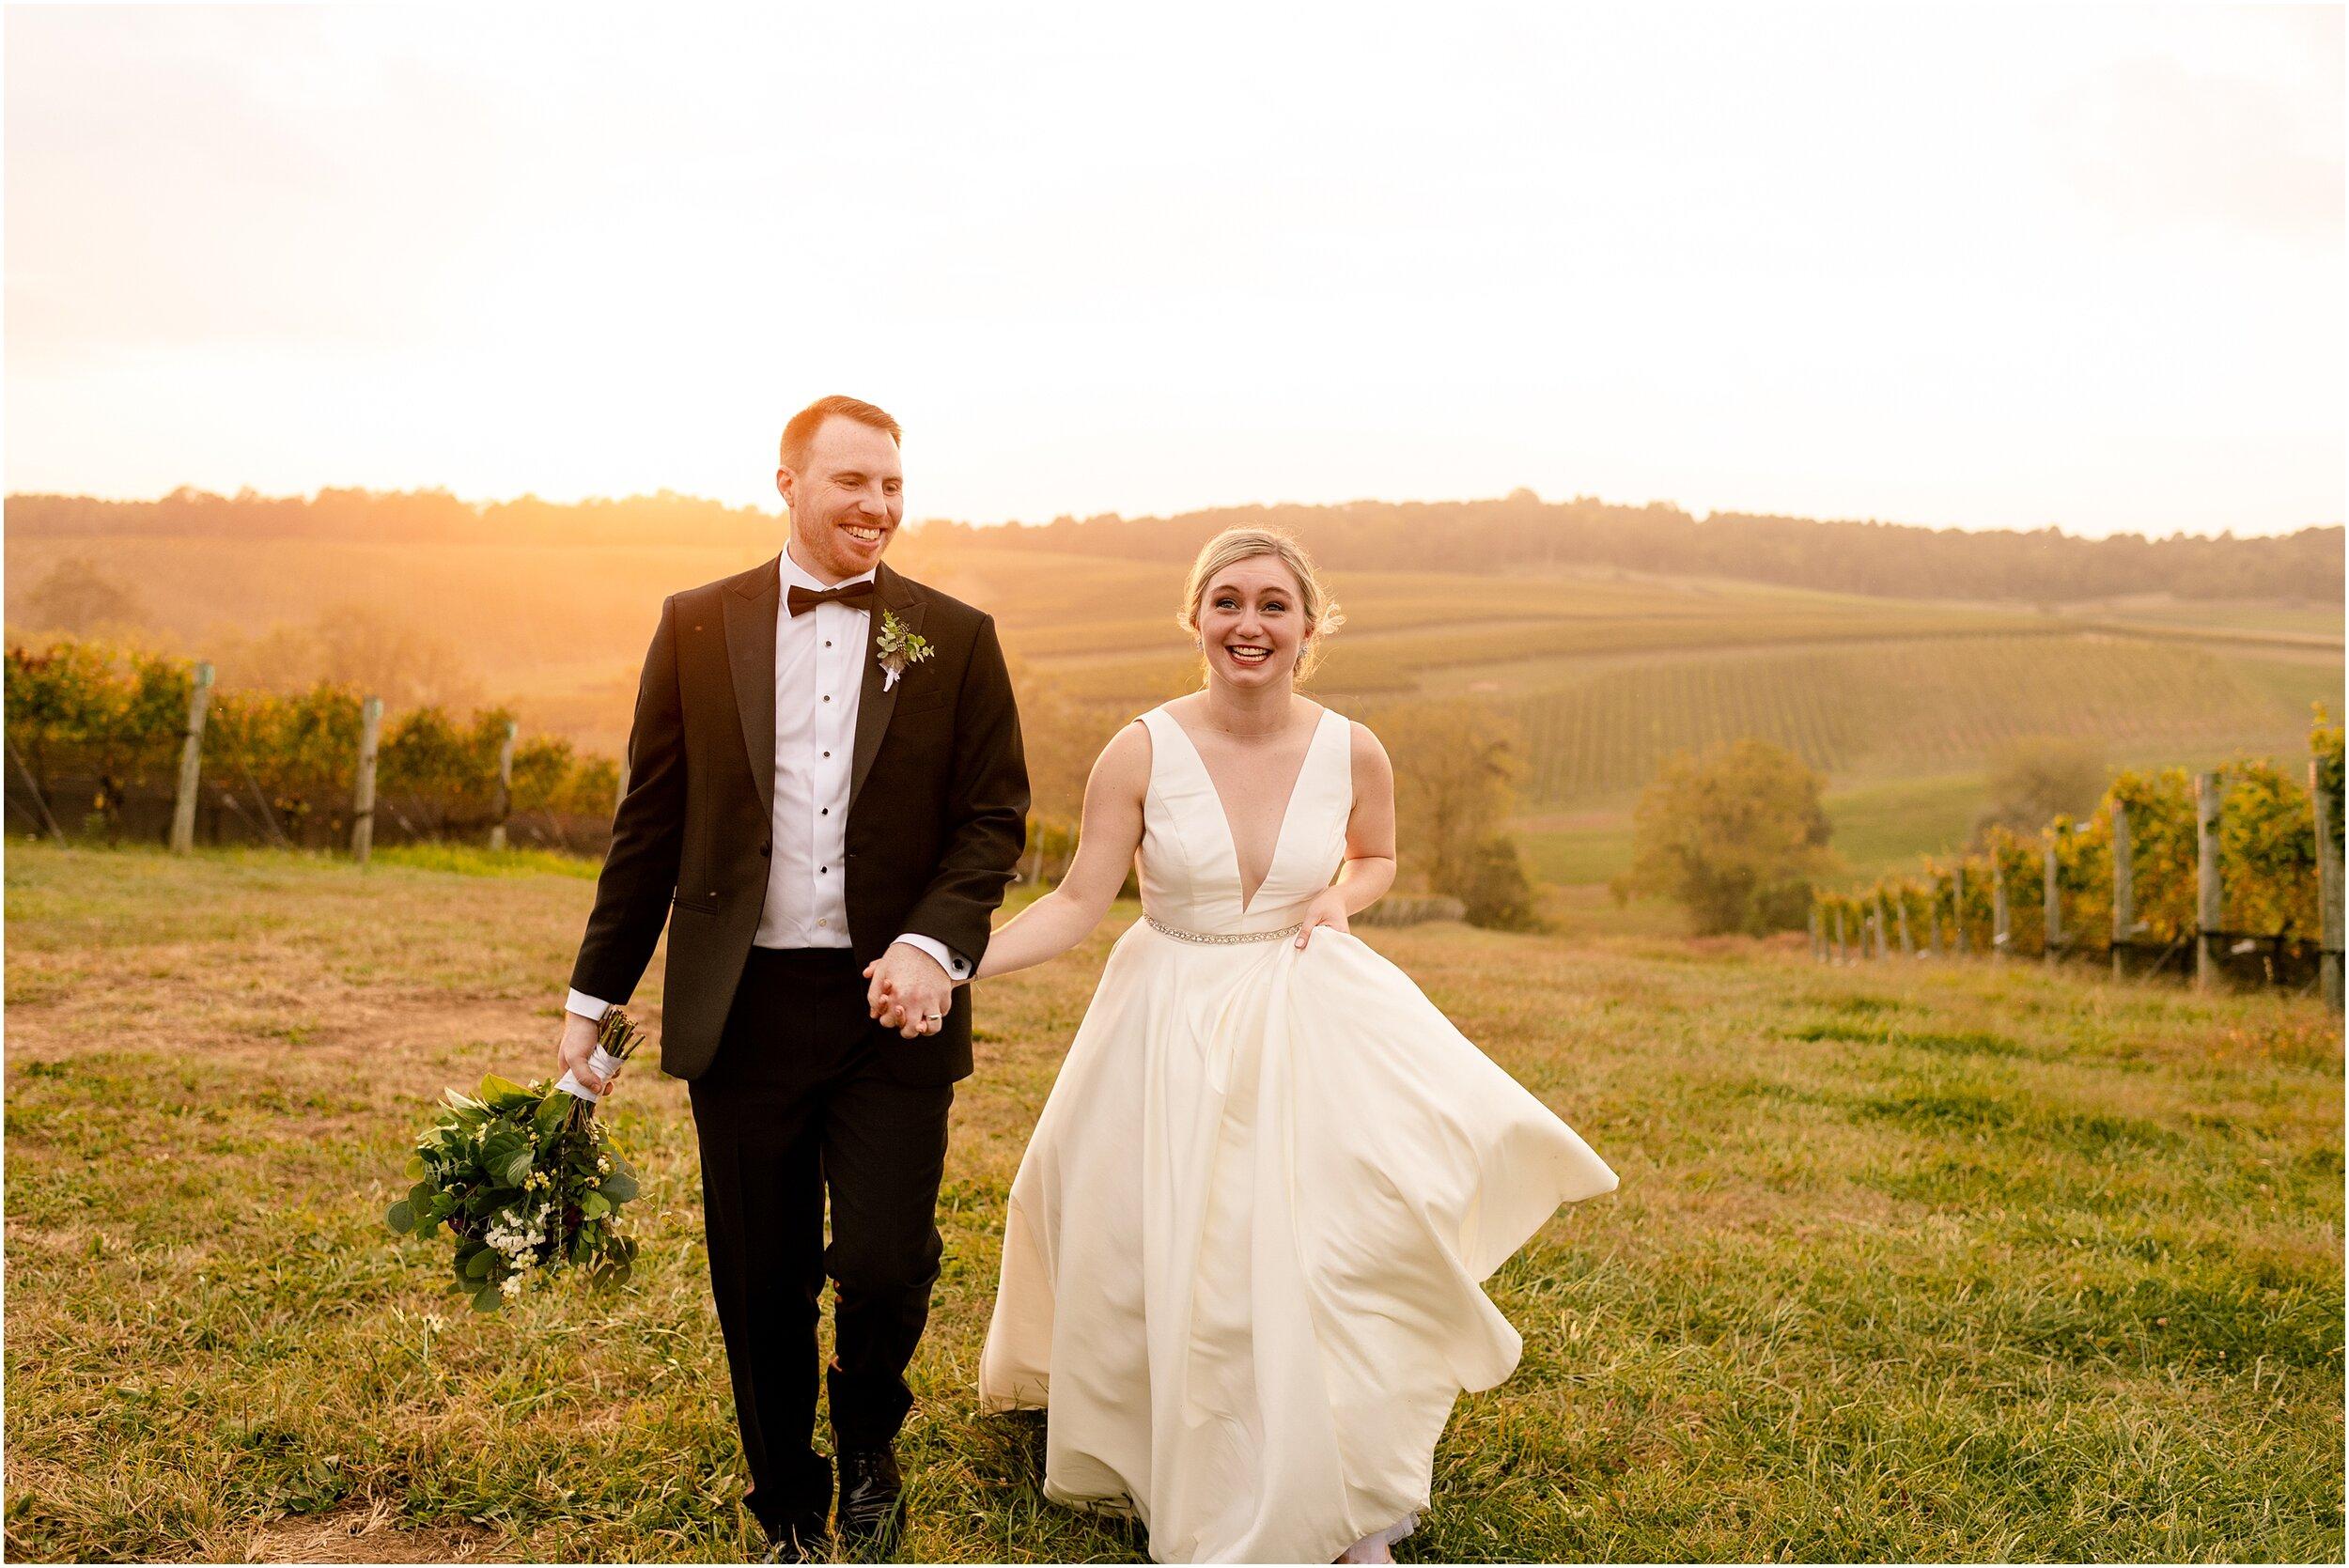 hannah leigh photography stone tower winery wedding leesburg va_3940.jpg